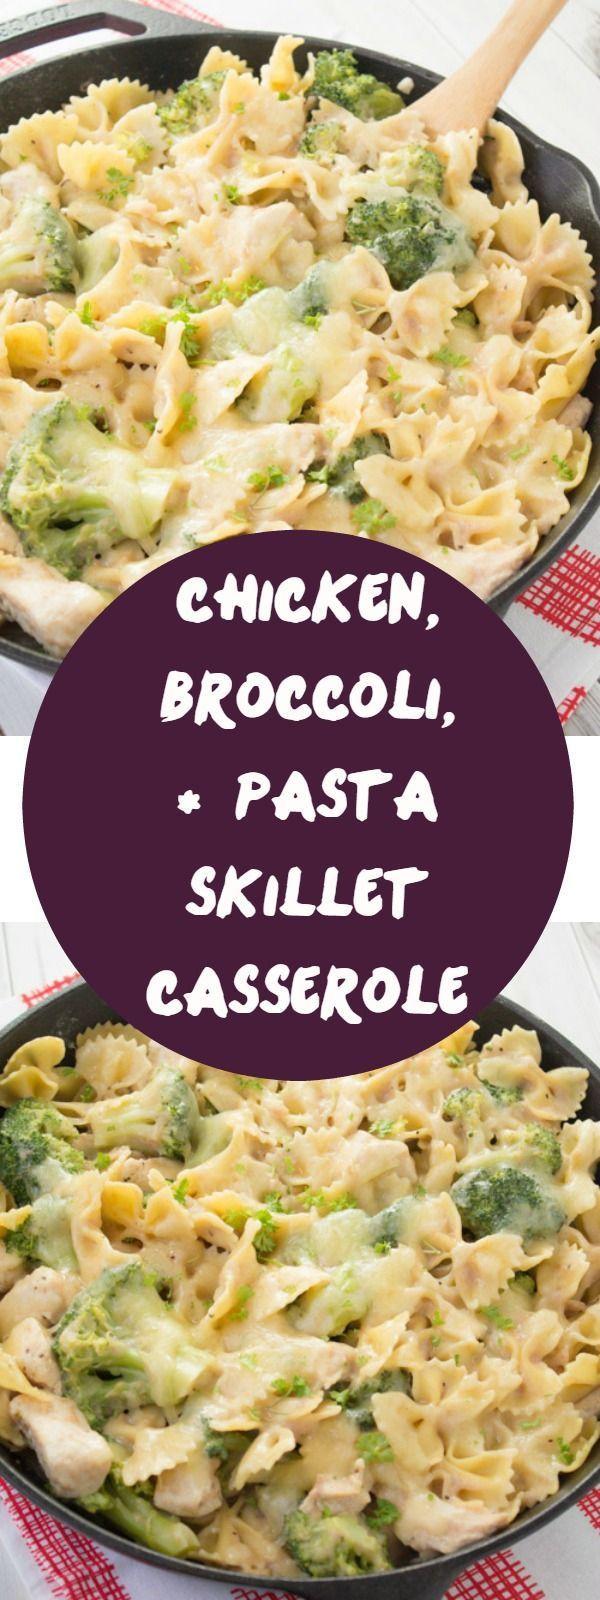 Chicken, Broccoli,  Pasta Skillet Casserole  Recipe -6537